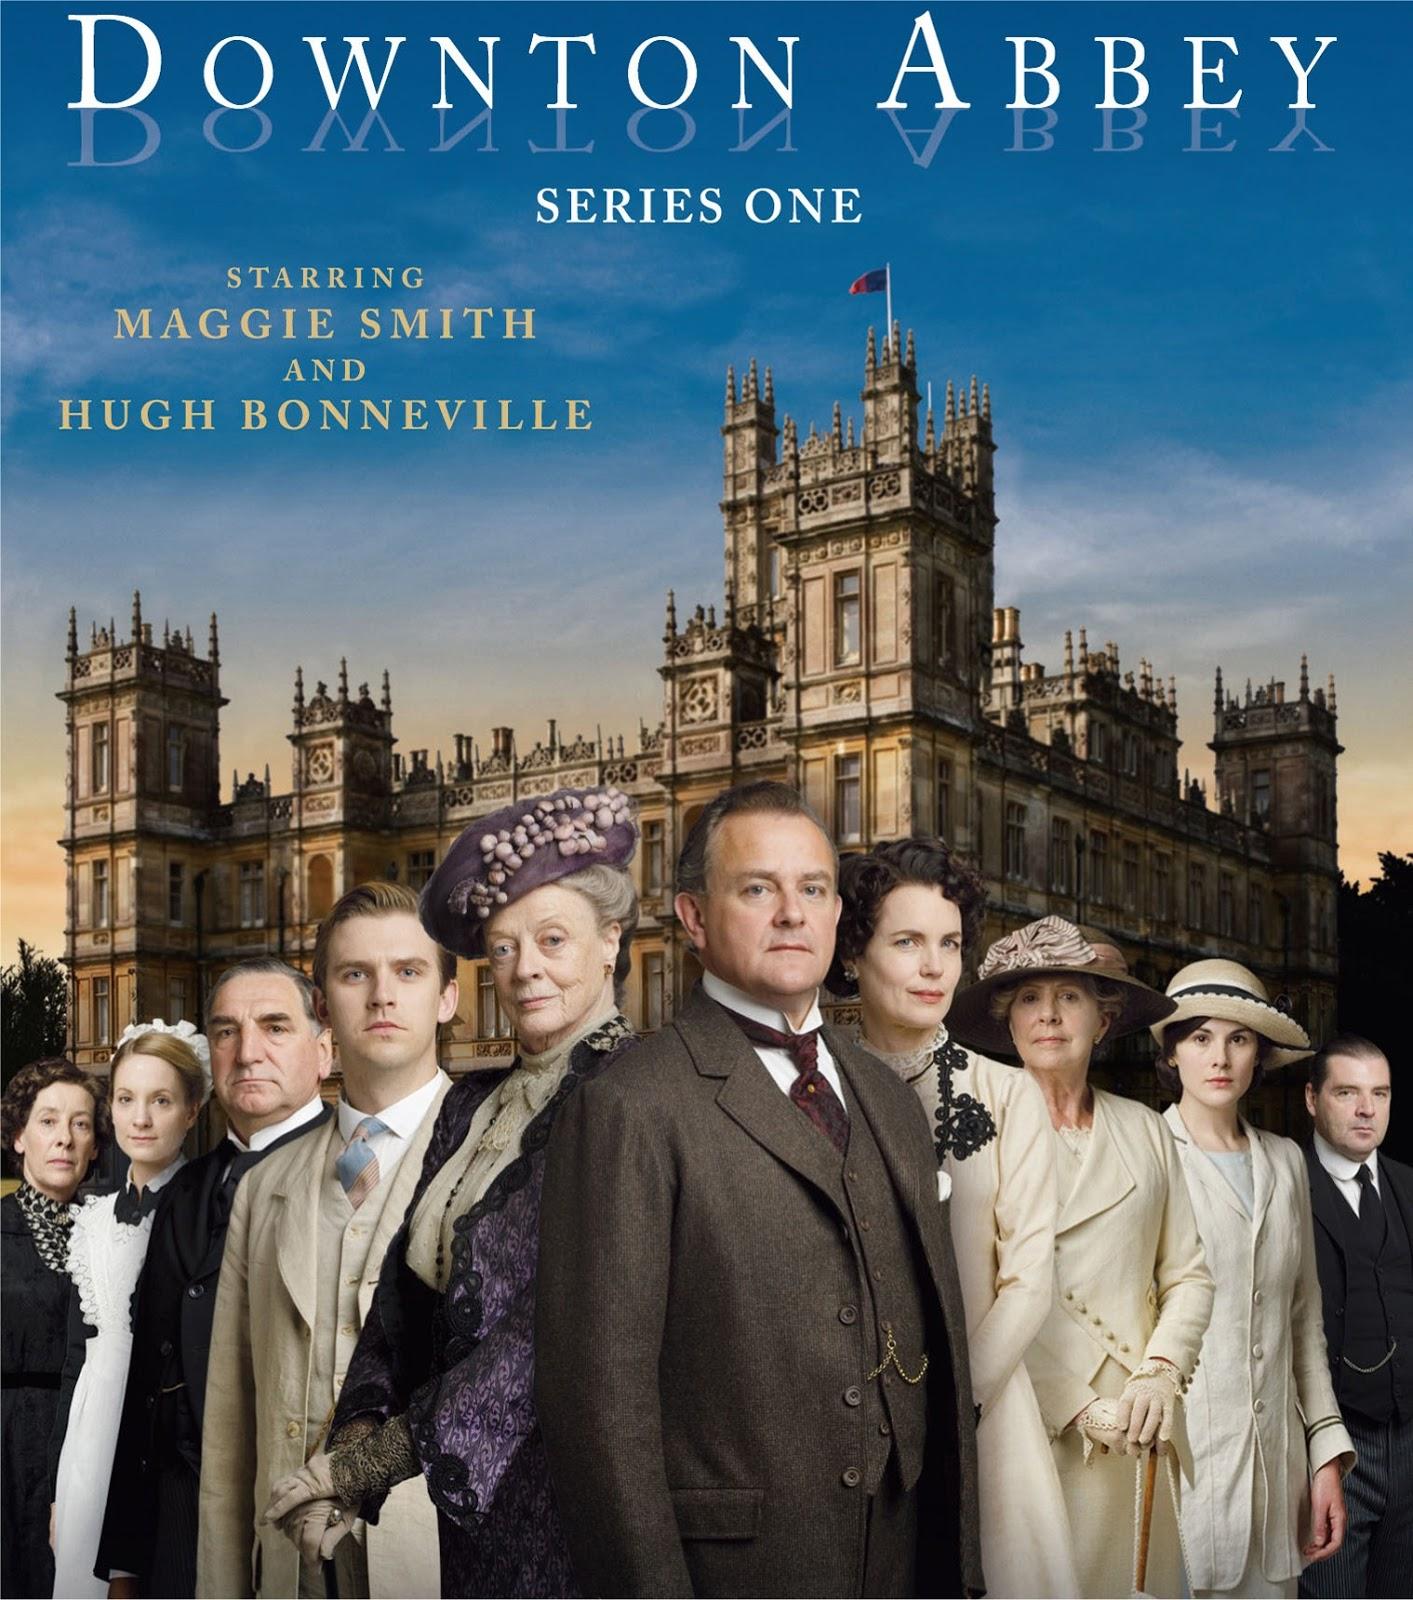 L'Alligatographe: Downton Abbey saison 1